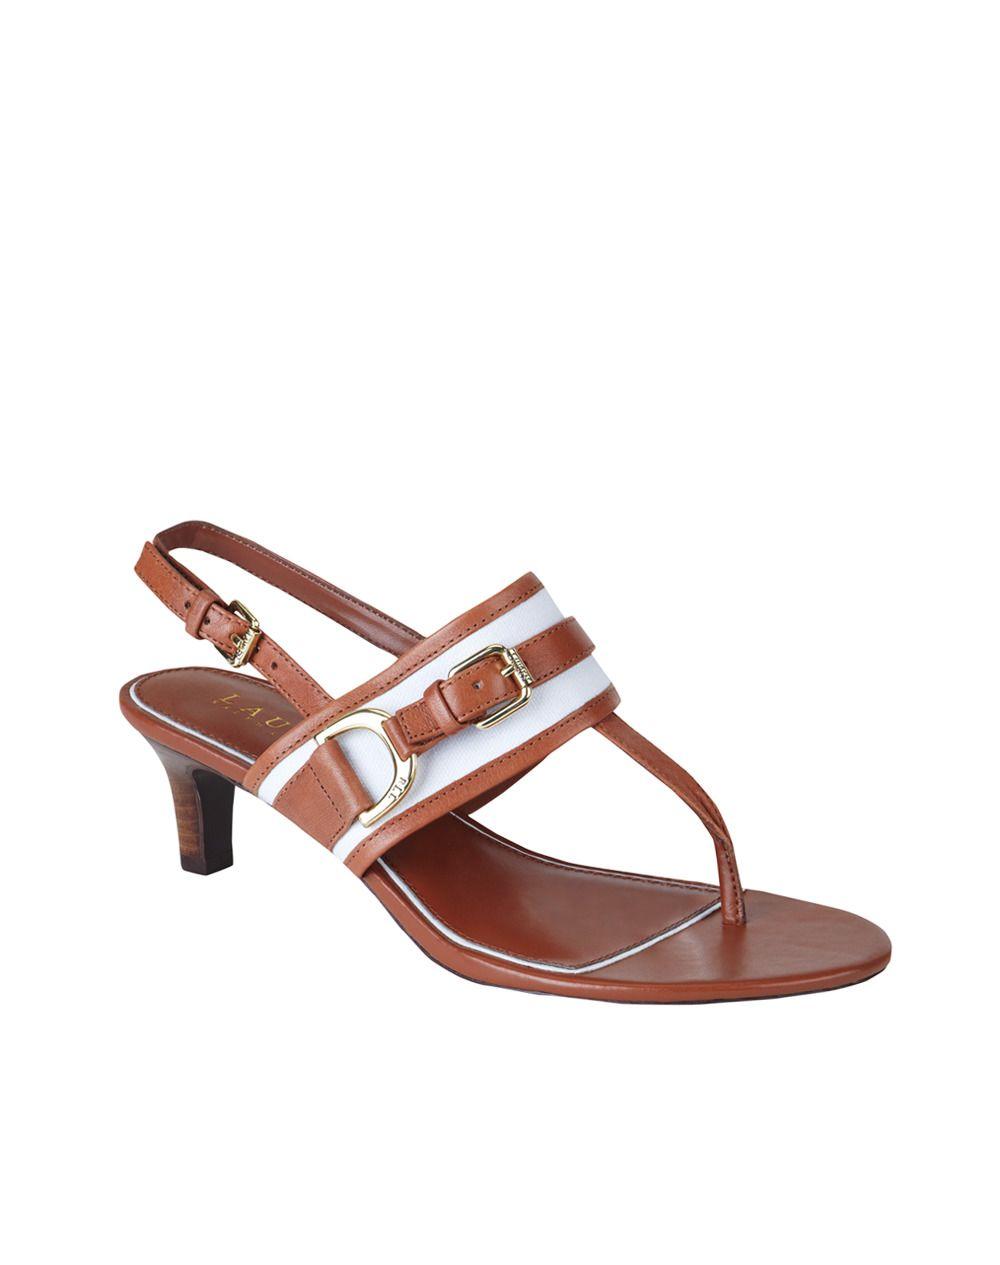 ccc8d711e30 Sandalias de mujer Lauren by Ralph Lauren - Mujer - Zapatos - El Corte  Inglés - Moda